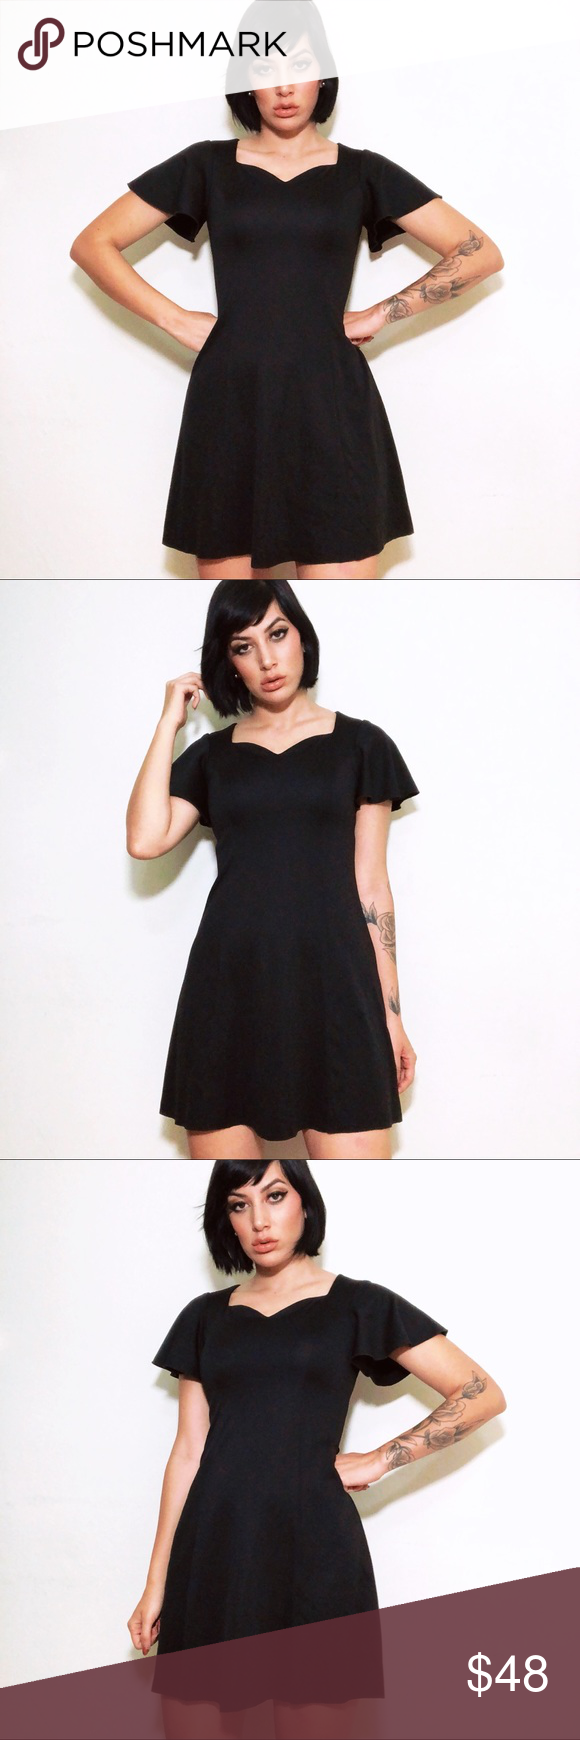 60s Black Babydoll Sweetheart Neck Mod Mini Dress Mod Mini Dress Dresses Mini Dress [ 1740 x 580 Pixel ]